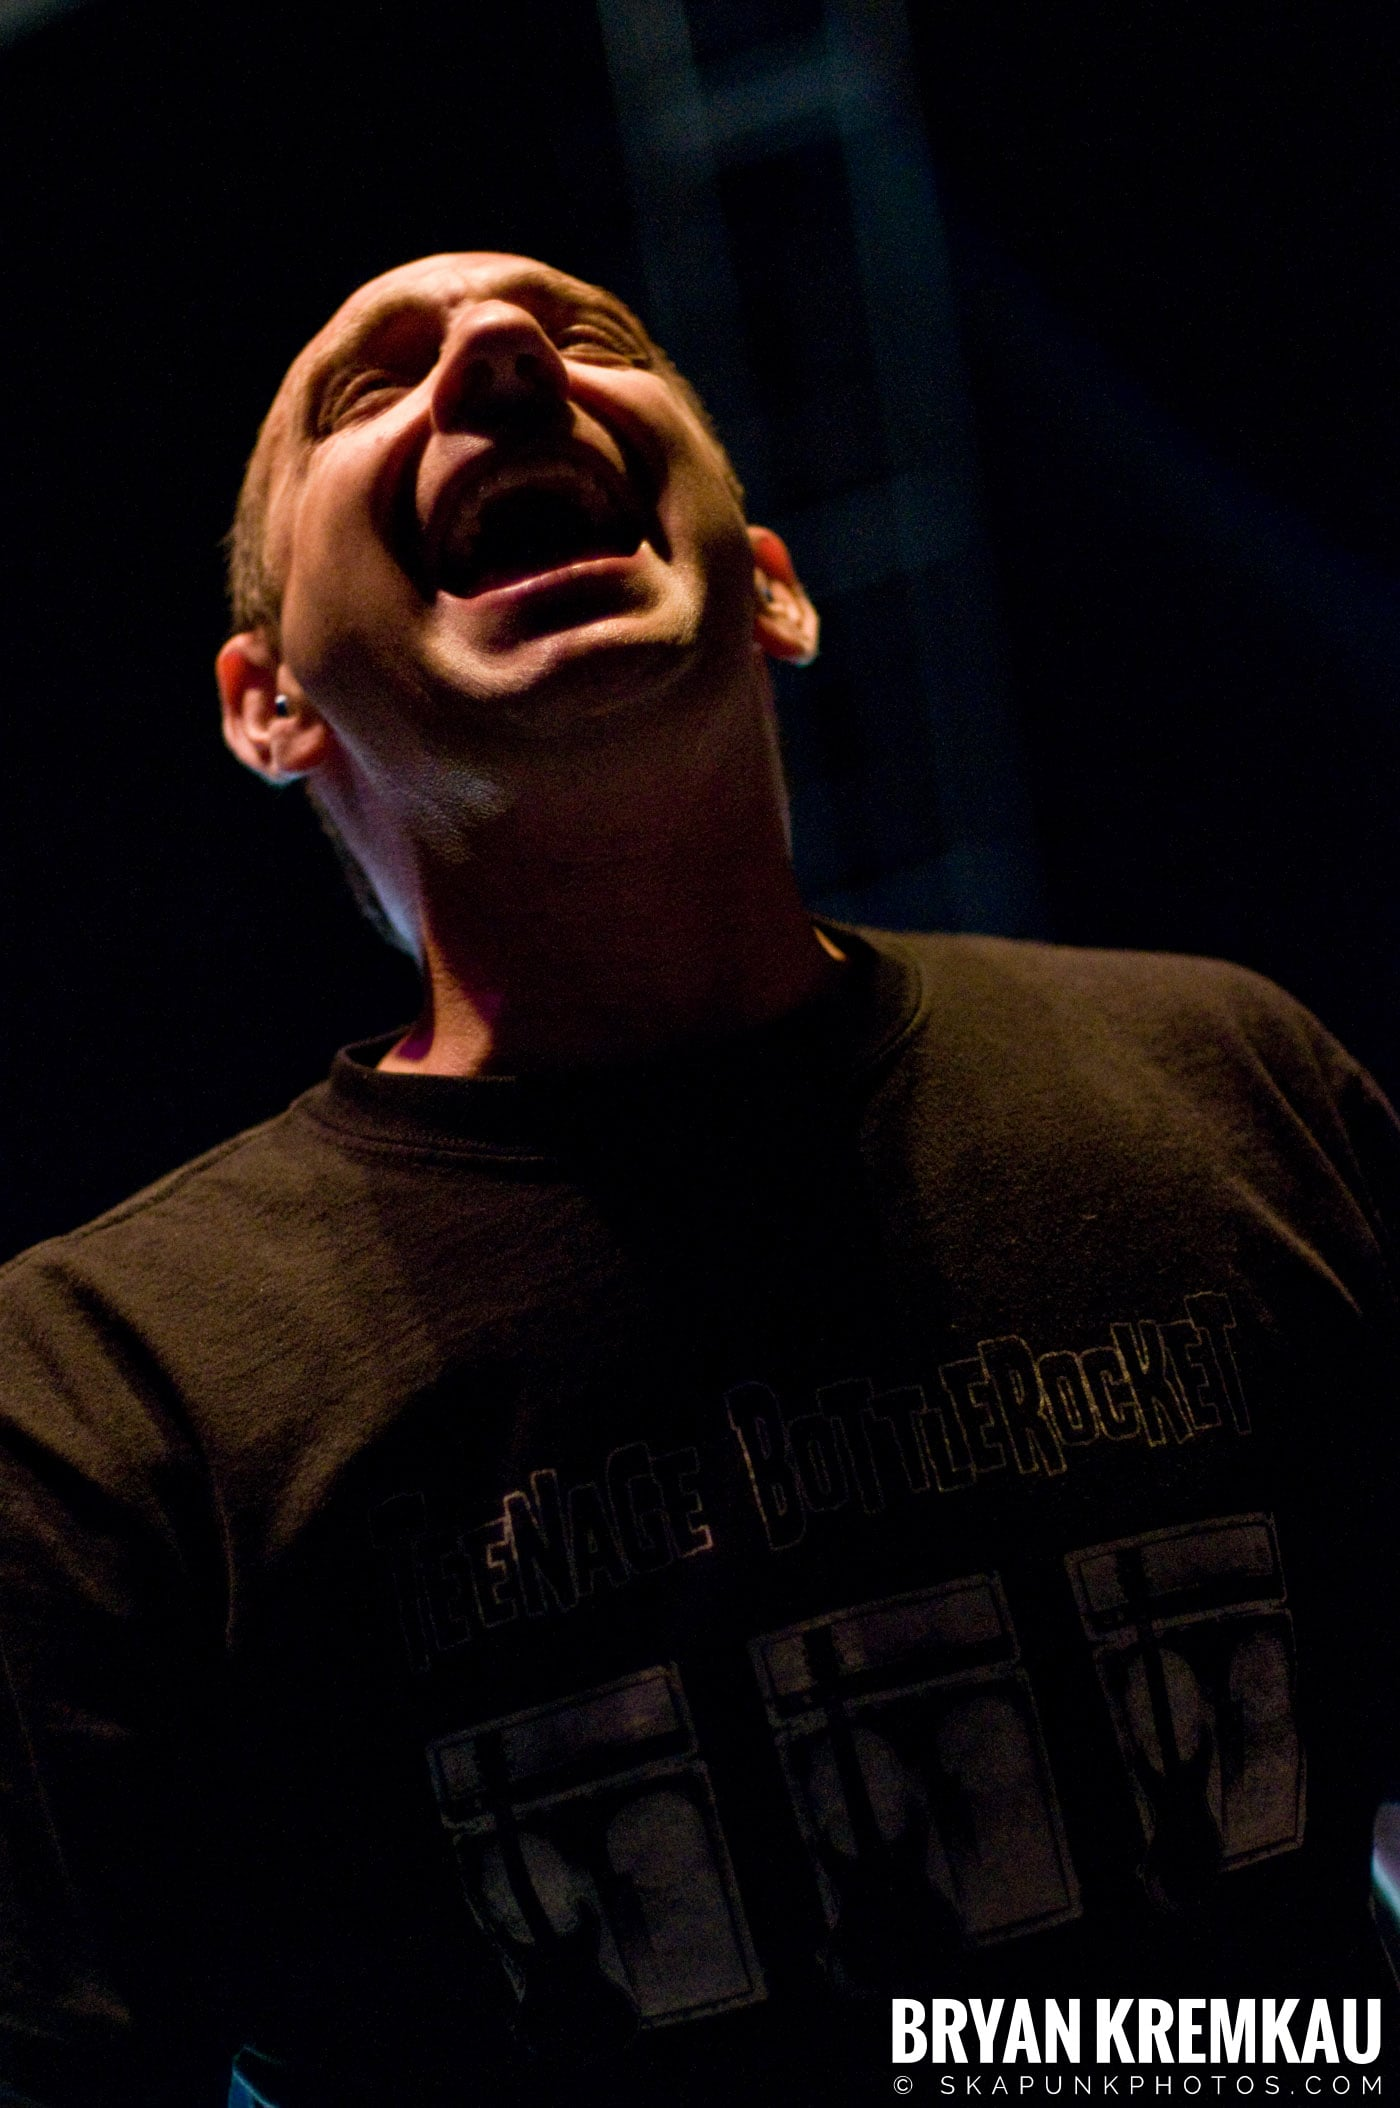 Less Than Jake @ Roseland Ballroom, NYC - 6.26.08 (22)